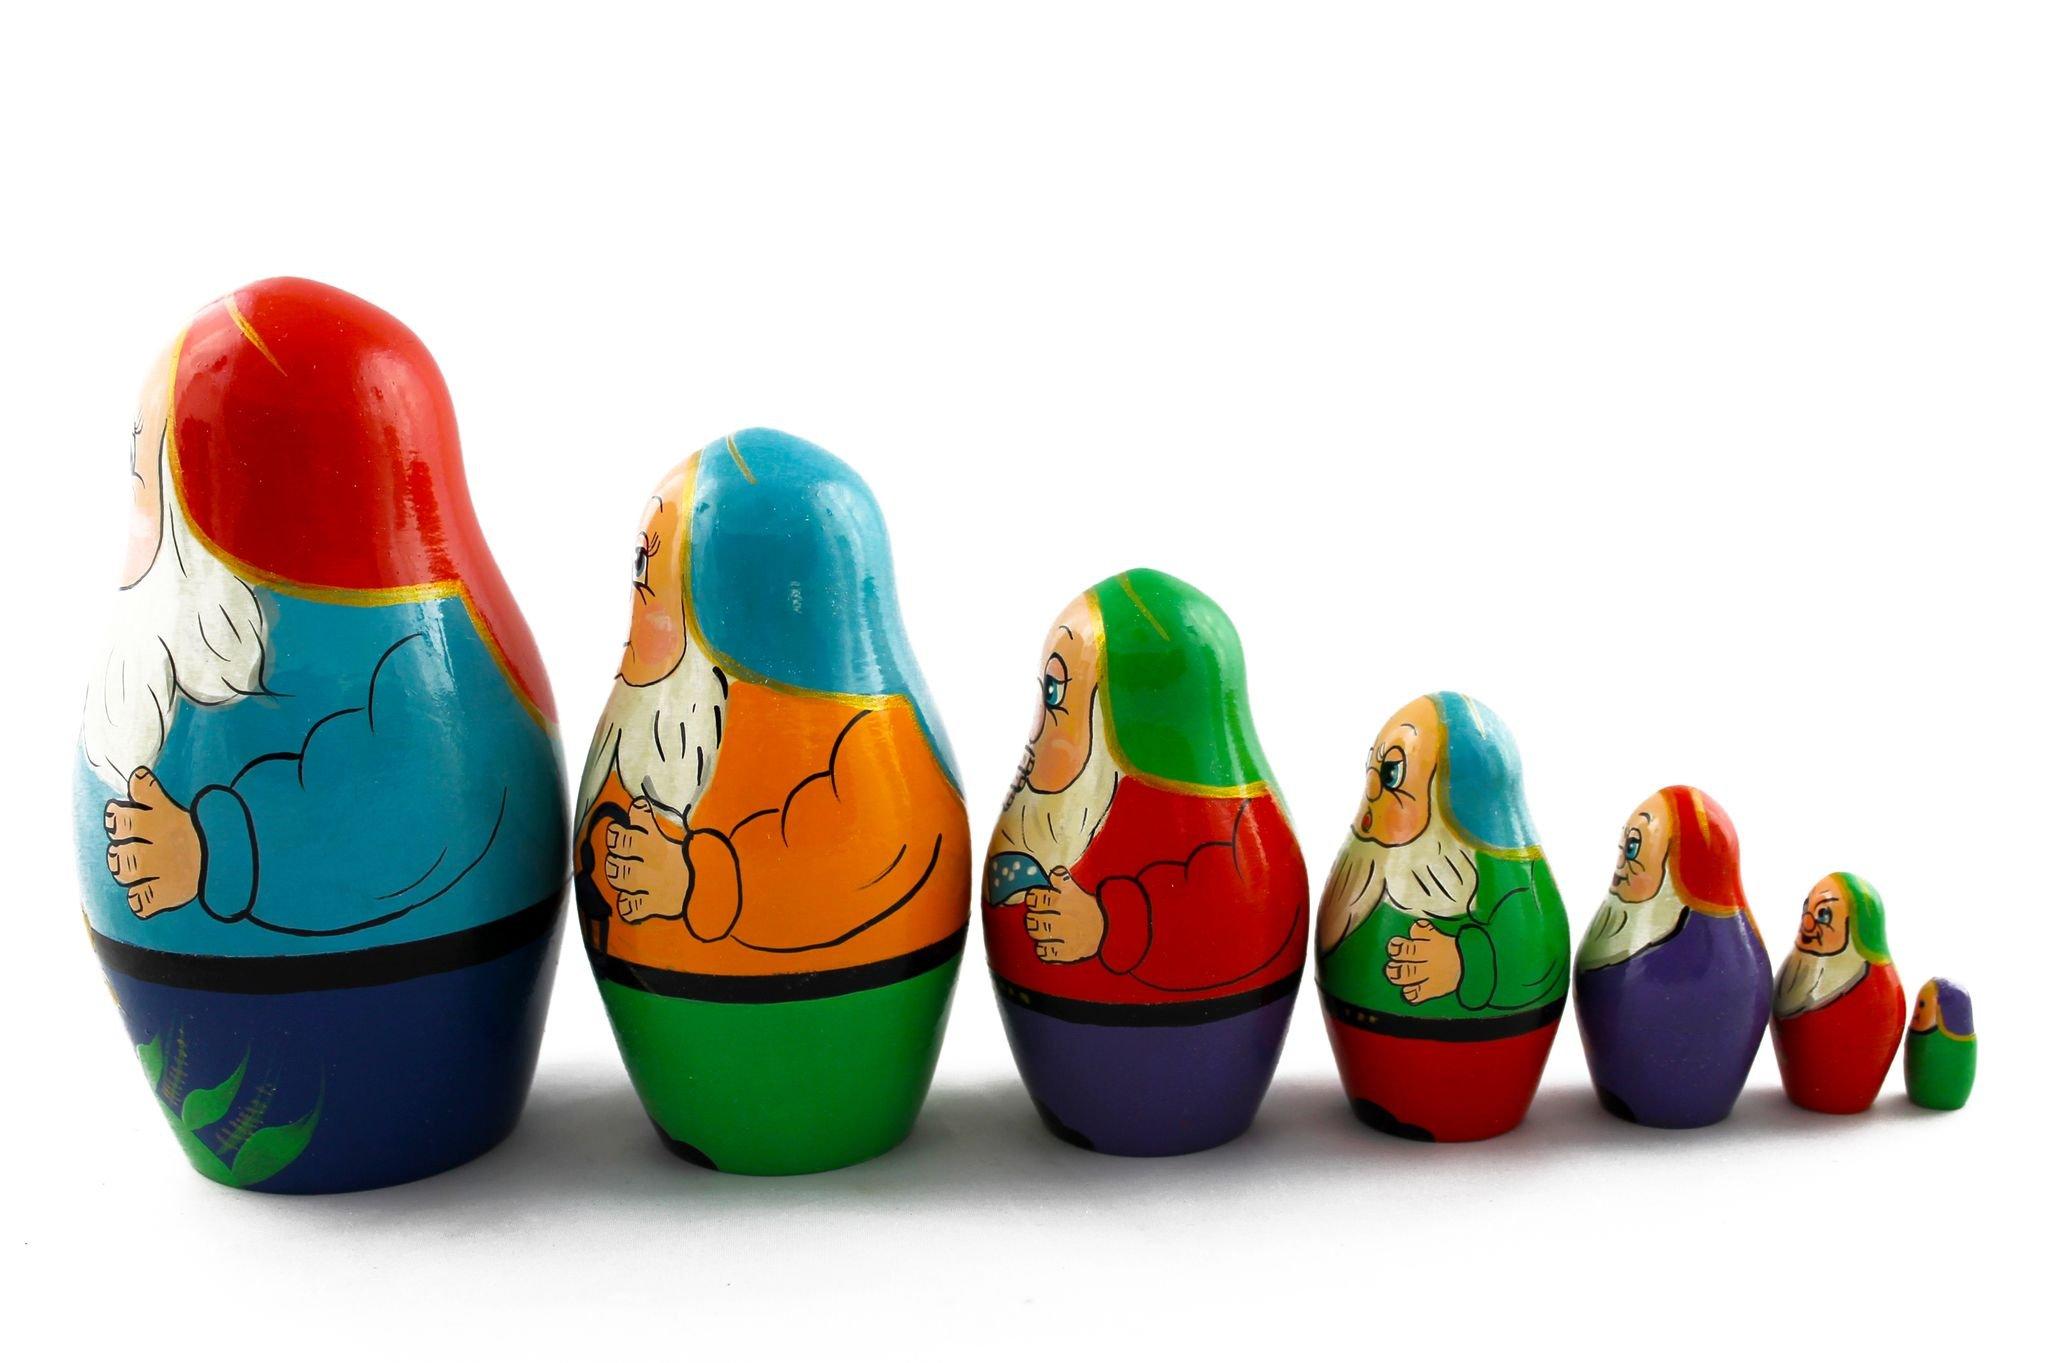 Matryoshka Russian Nesting Doll Babushka Beautiful Dwarf Seven Dwarfs Set 7 Pieces Pcs Hand Painted Handmade Souvenir Gift Handicraft by MATRYOSHKA&HANDICRAFT (Image #4)